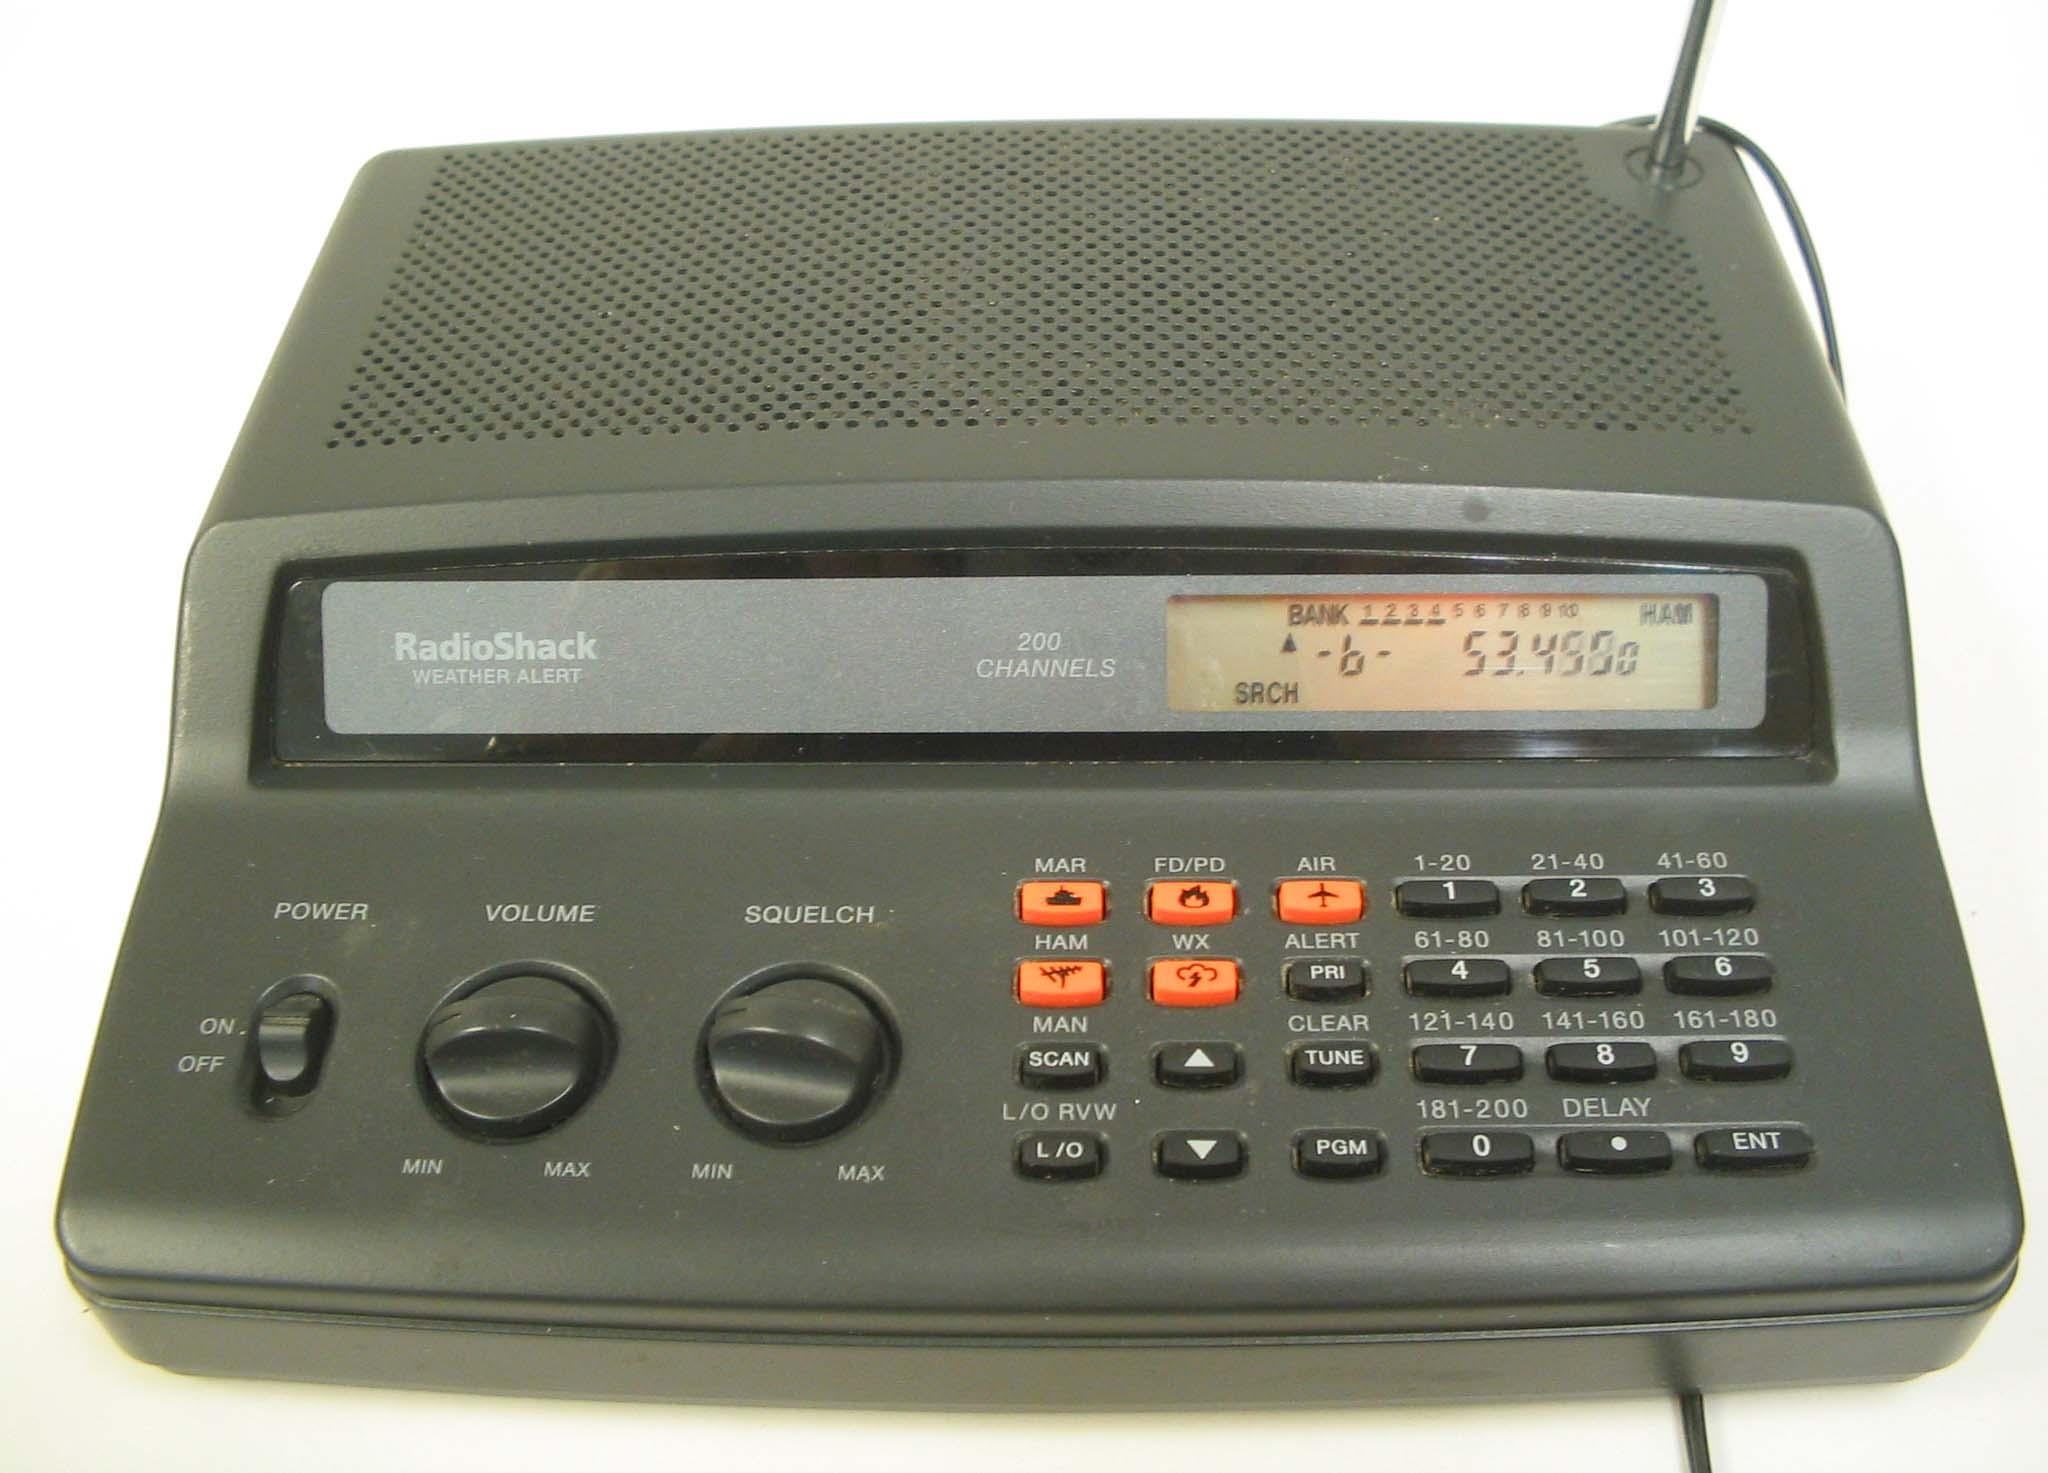 radio shack scanner manuals rh radio shack scanner manuals fullybelly de radio shack weather alert 200 channel scanner manual radio shack pro 404 200 channel scanner manual